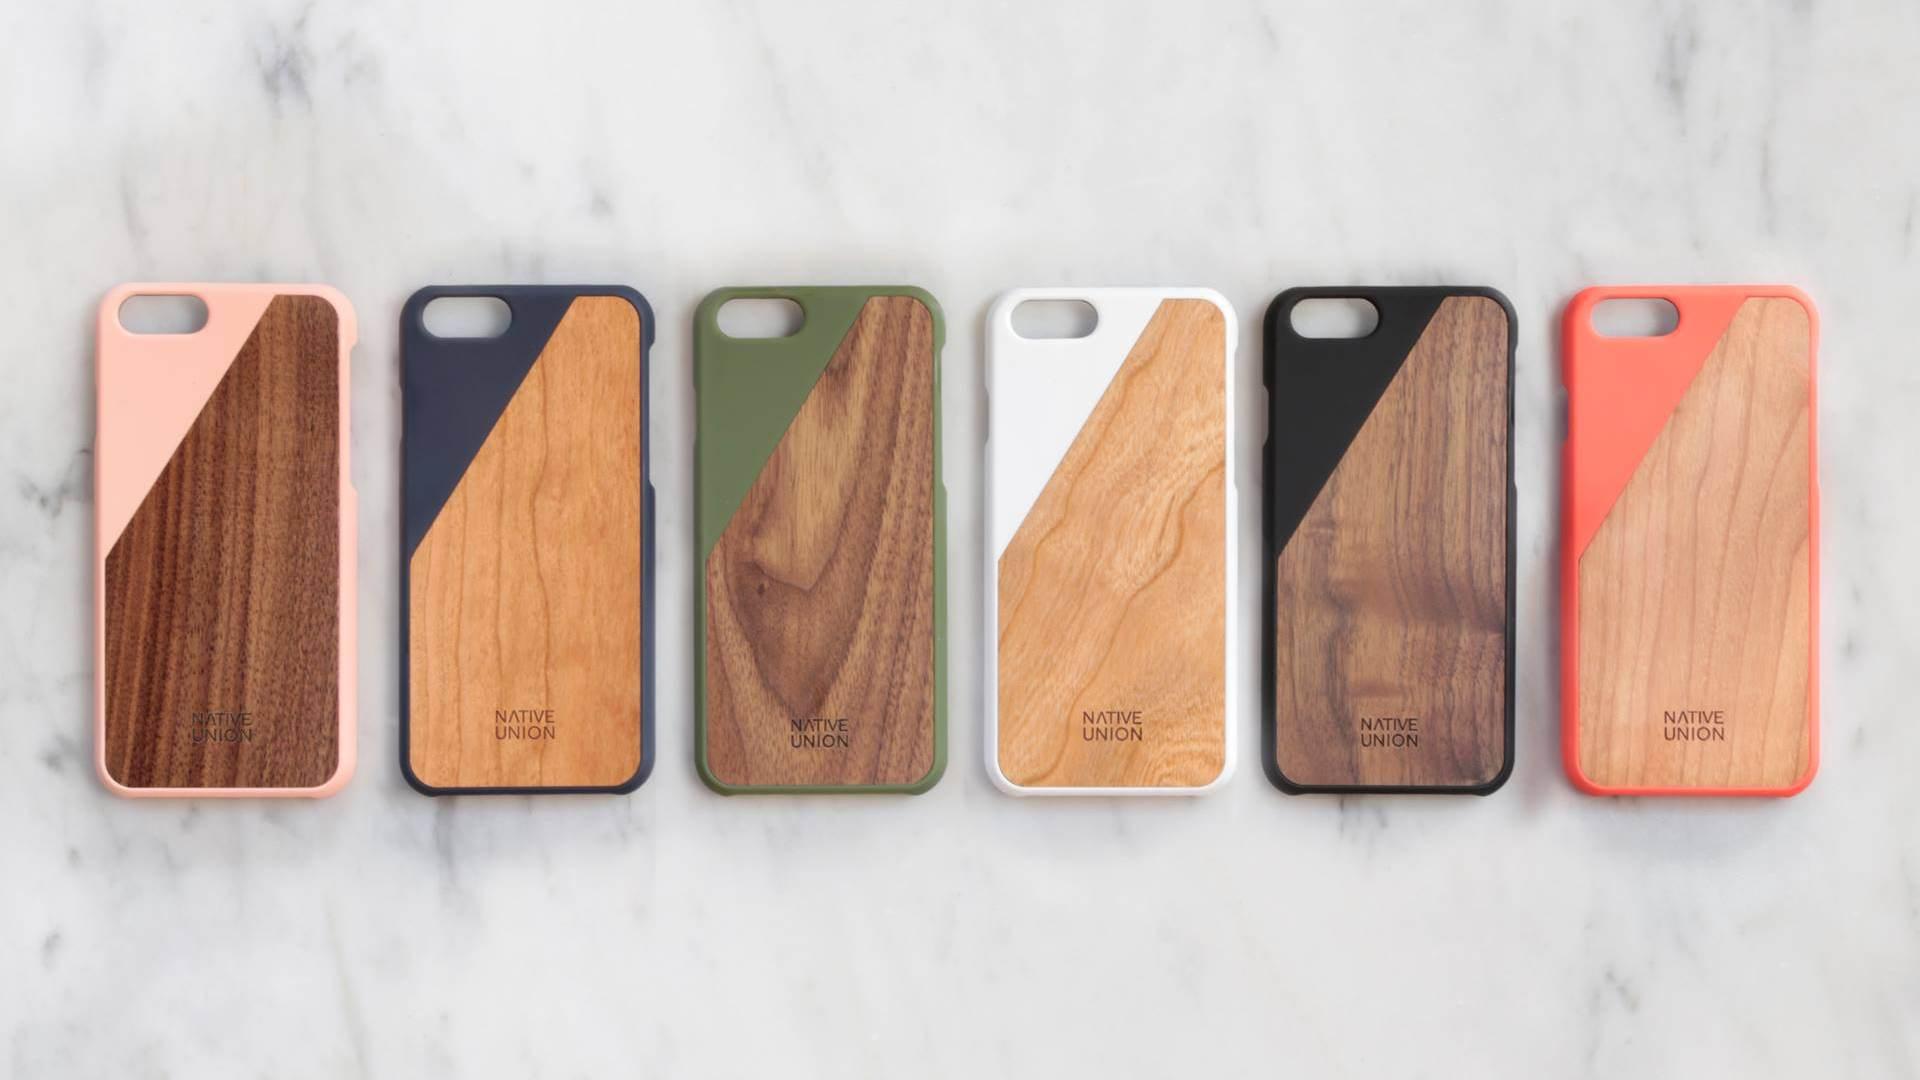 Native-Union-Clic-Wood